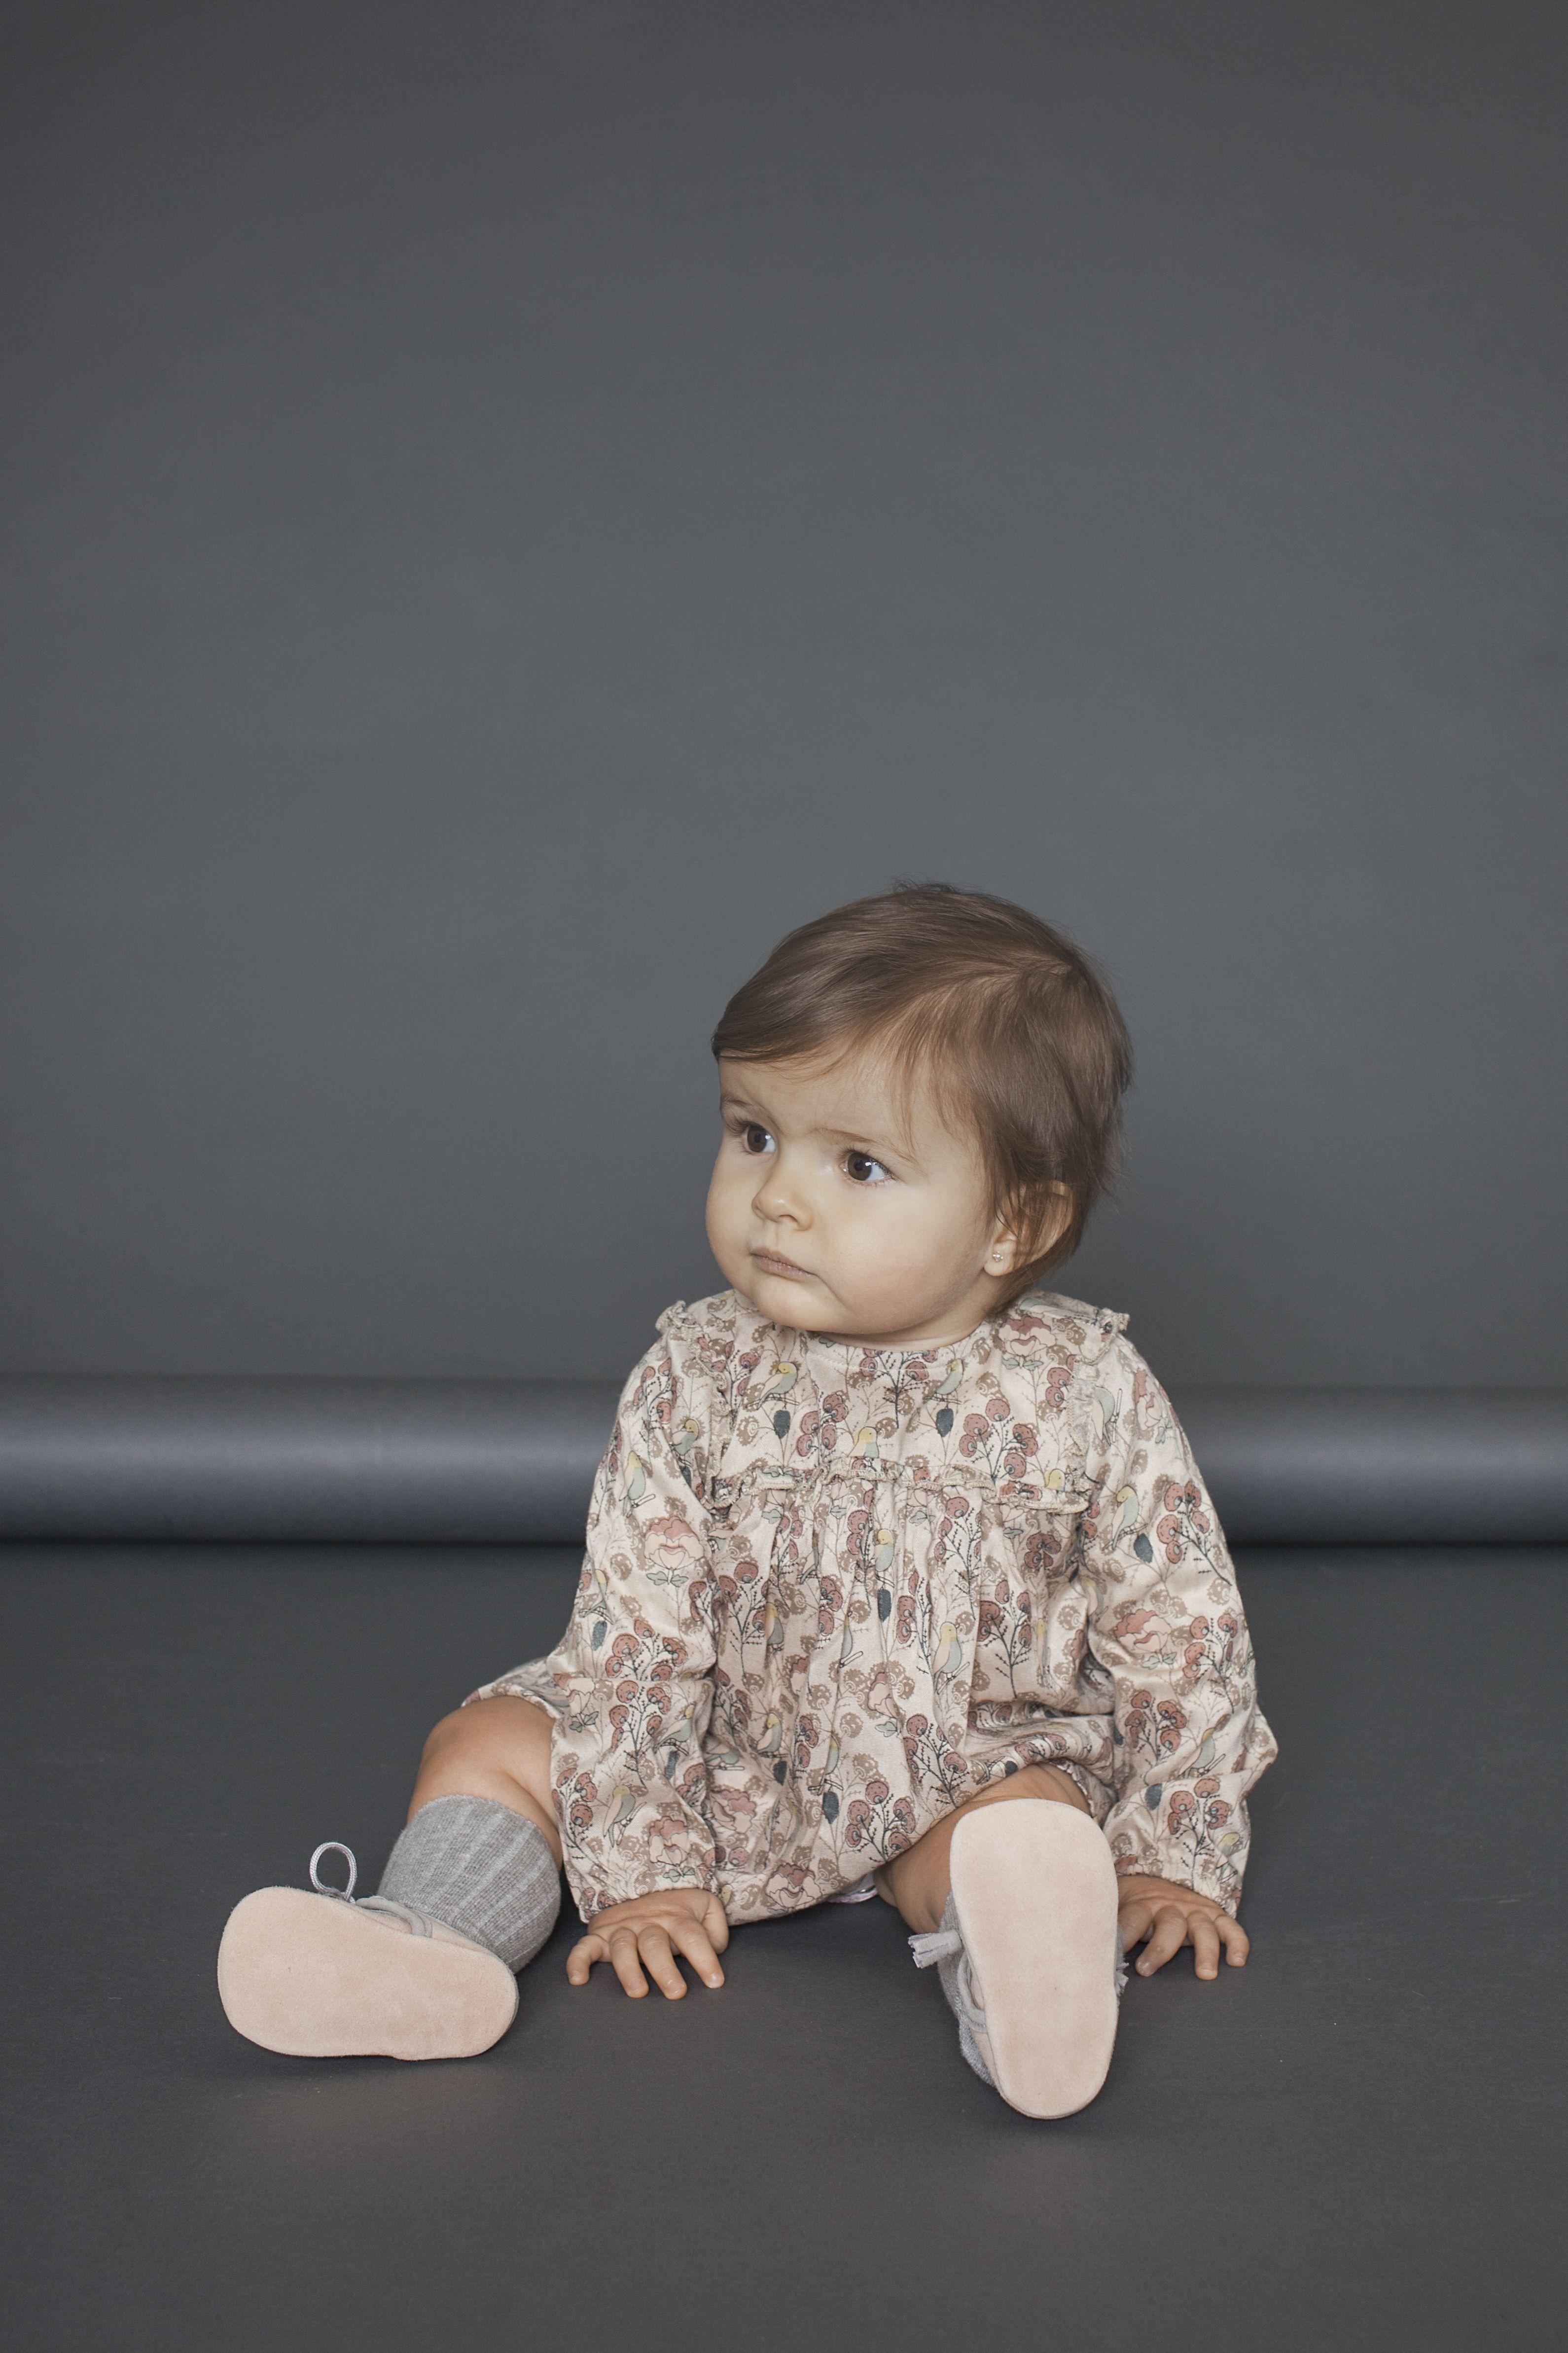 Pin de esther rvillarreal en vestidos | Pinterest | Bebe, Ropa bebe ...